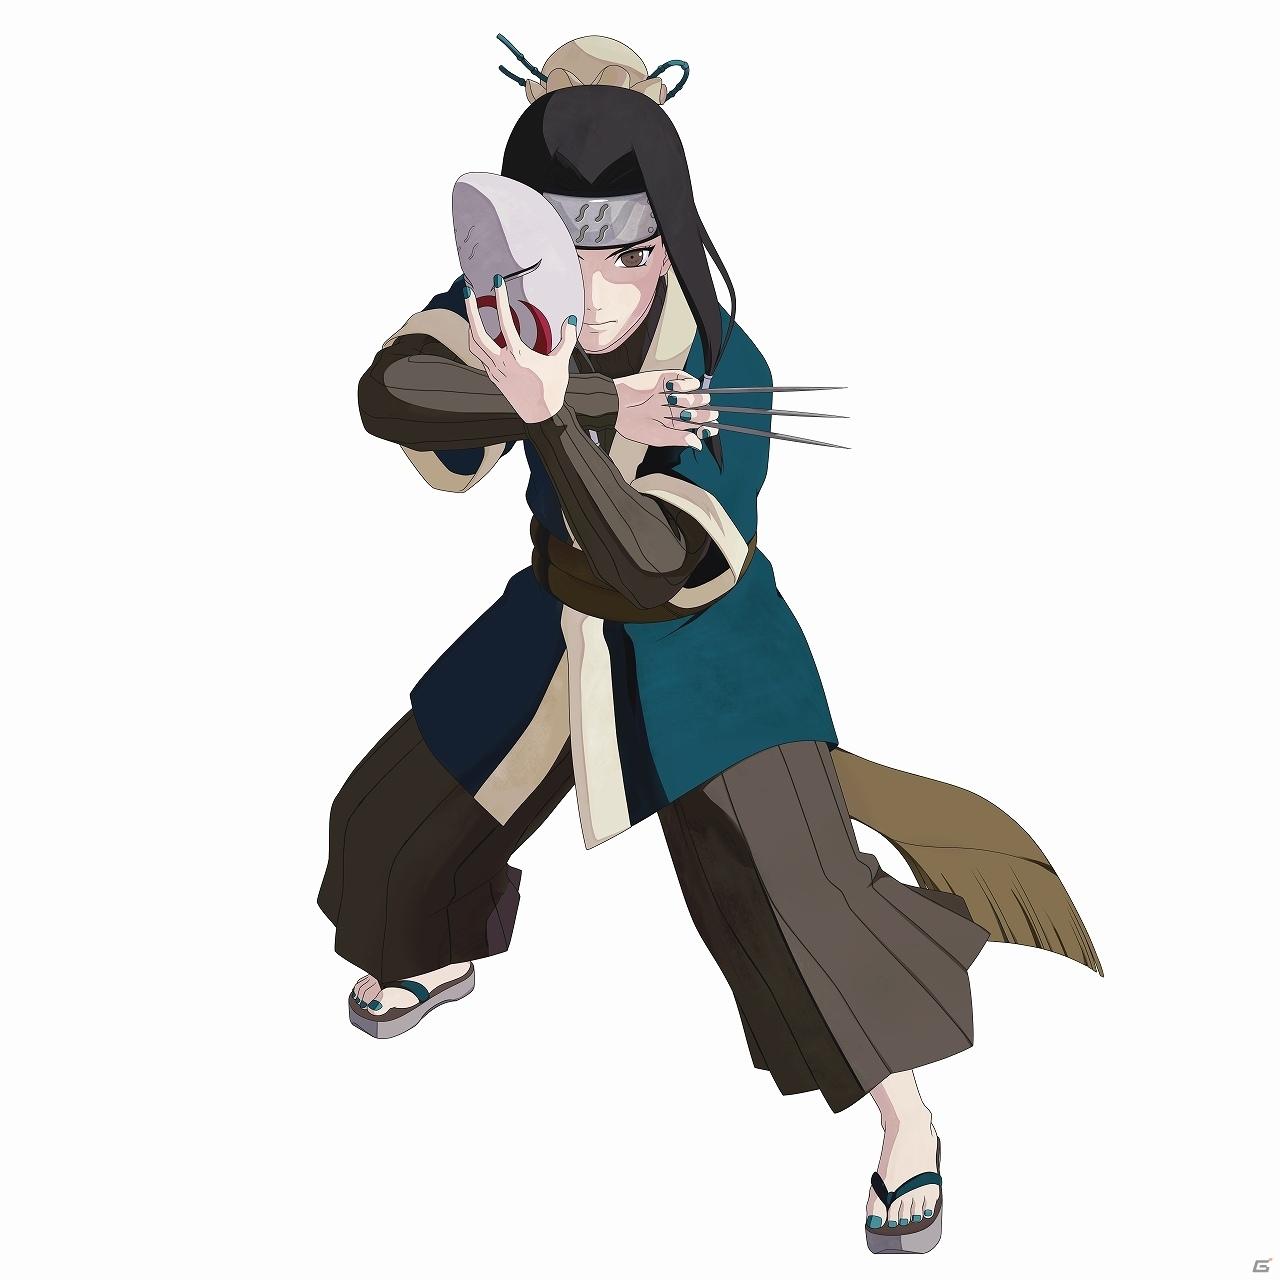 「NARUTO TO BORUTO シノビストライカー」師匠キャラクター同士で対戦を行うイベント「忍界英雄祭」が開催!